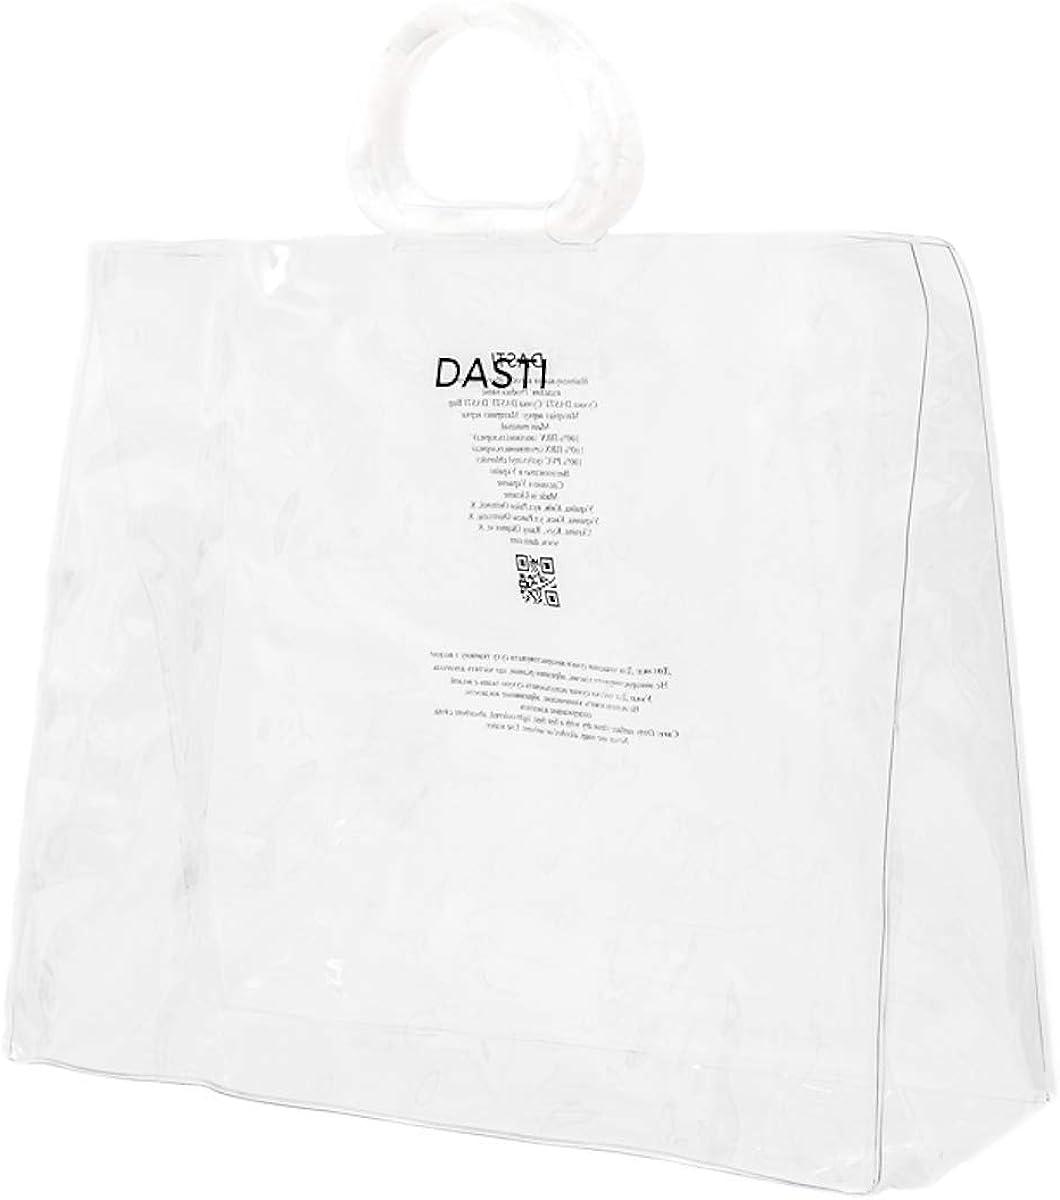 Pool Bag - Beach Bag - Beach Bags Totes Waterproof - Large Beach Bag